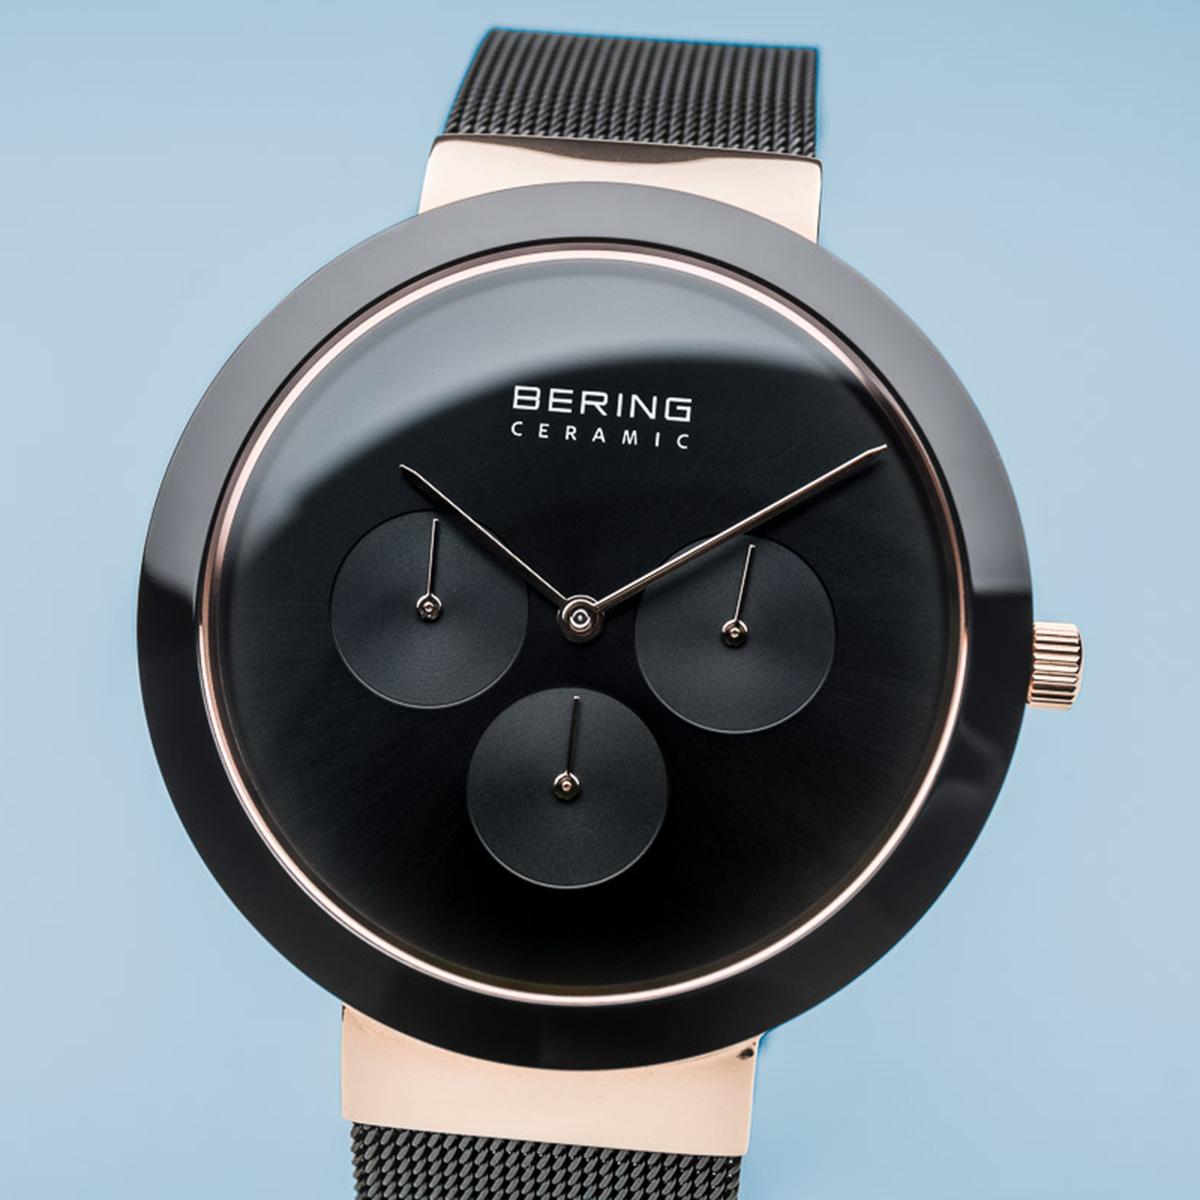 Zegarek męski Bering ceramic 35040-166 - duże 2